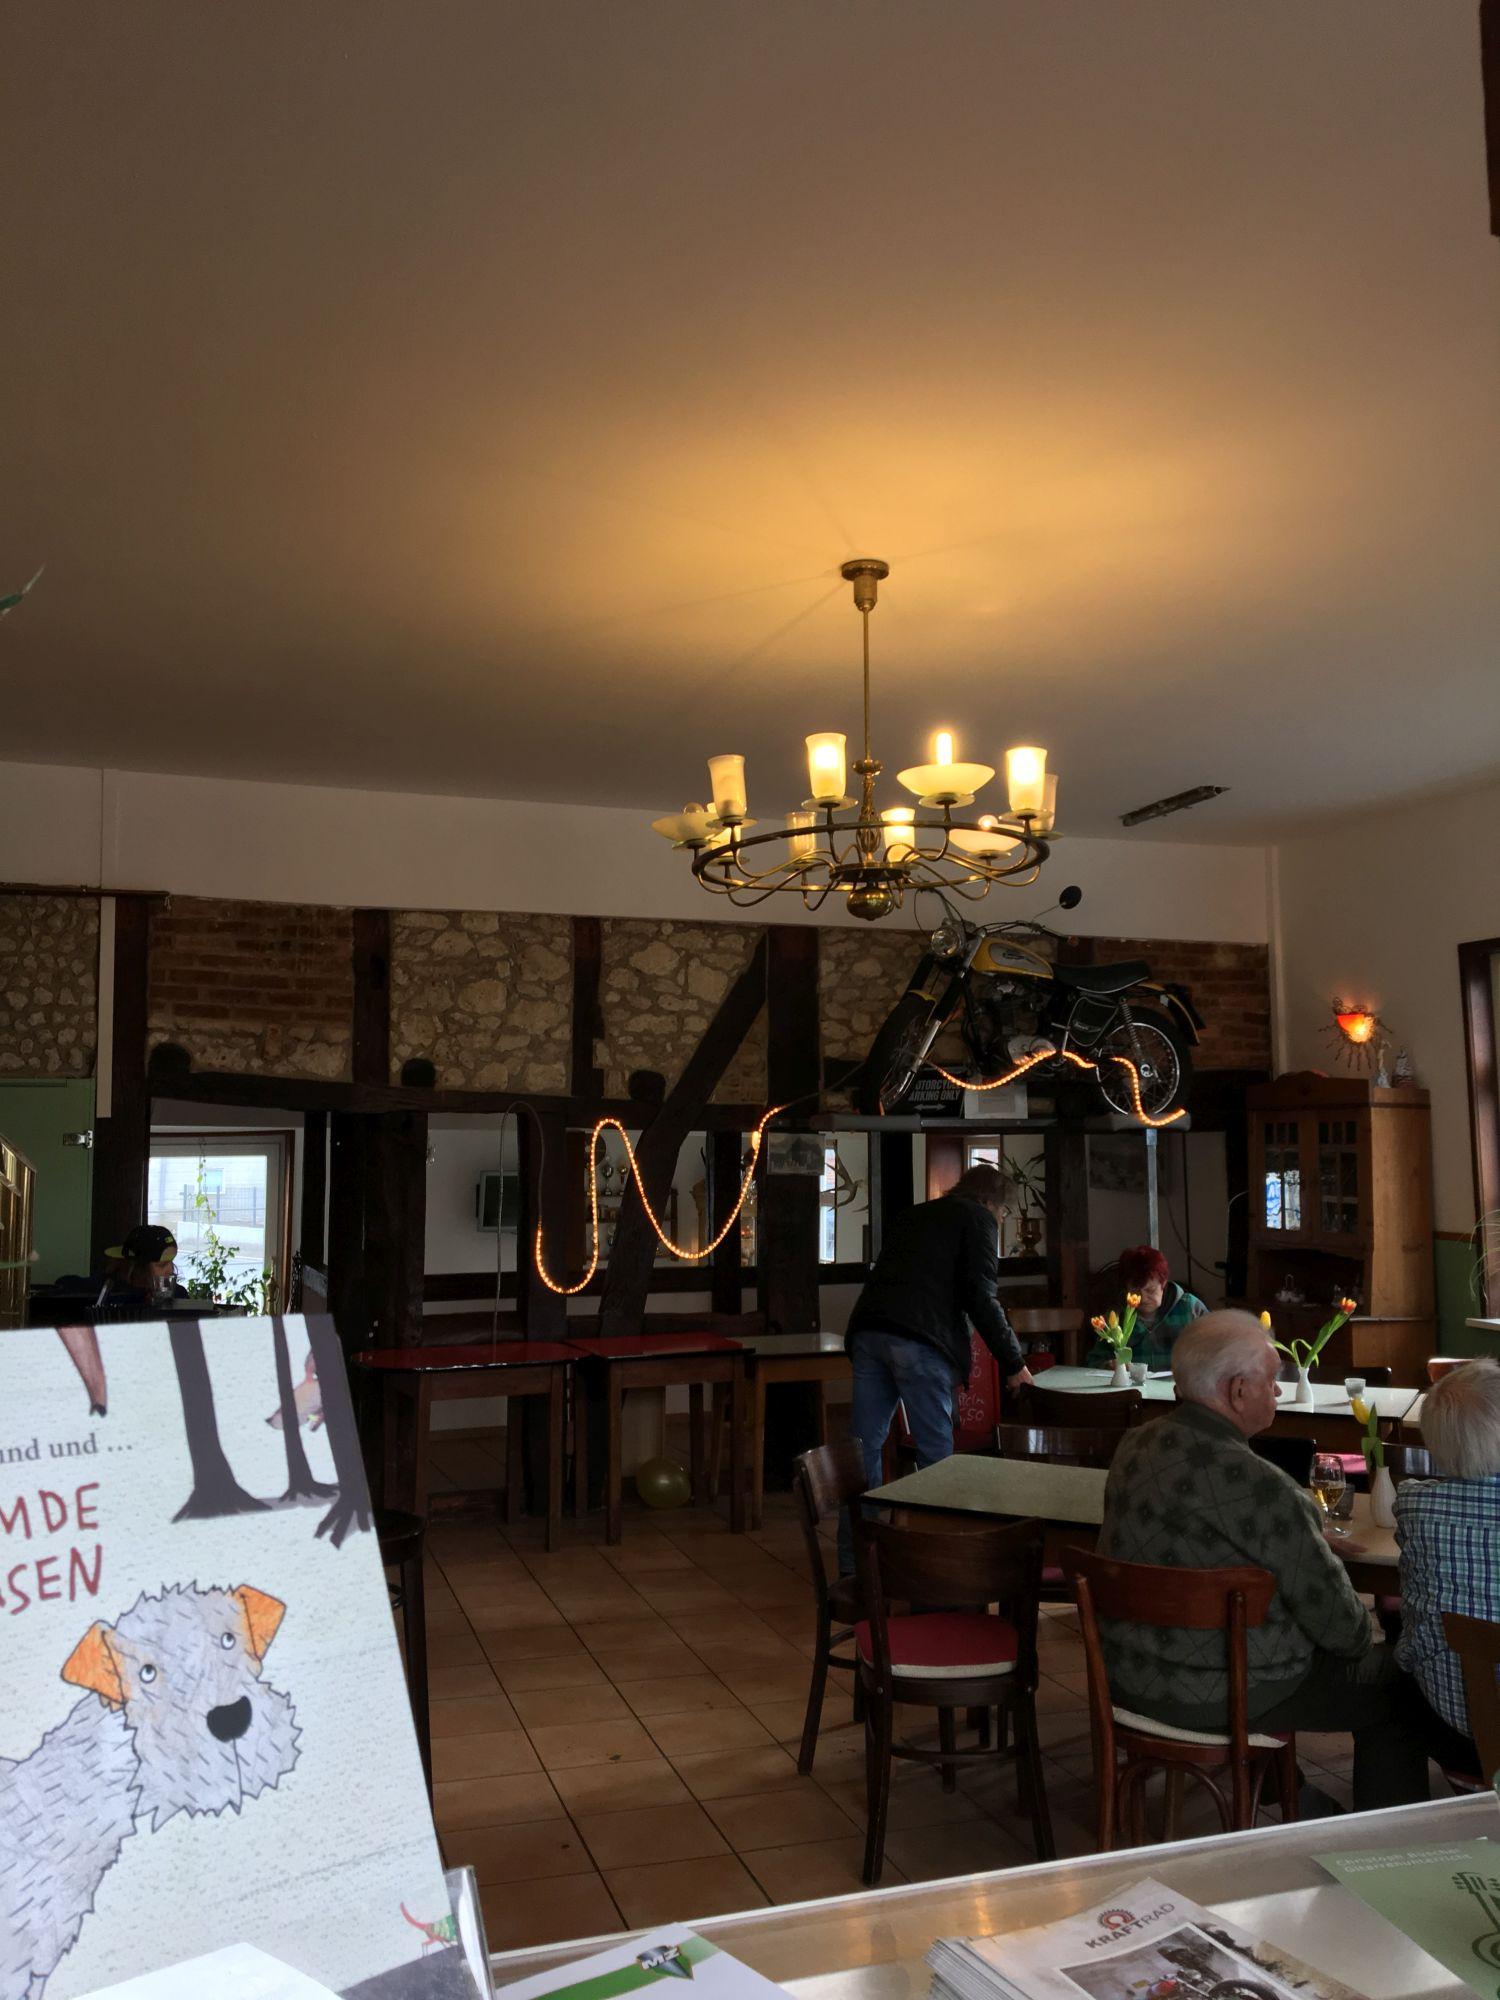 Noerdliches_Harzvorland_Reitlingstal_Elm_Cafe_Vintage_innen_4